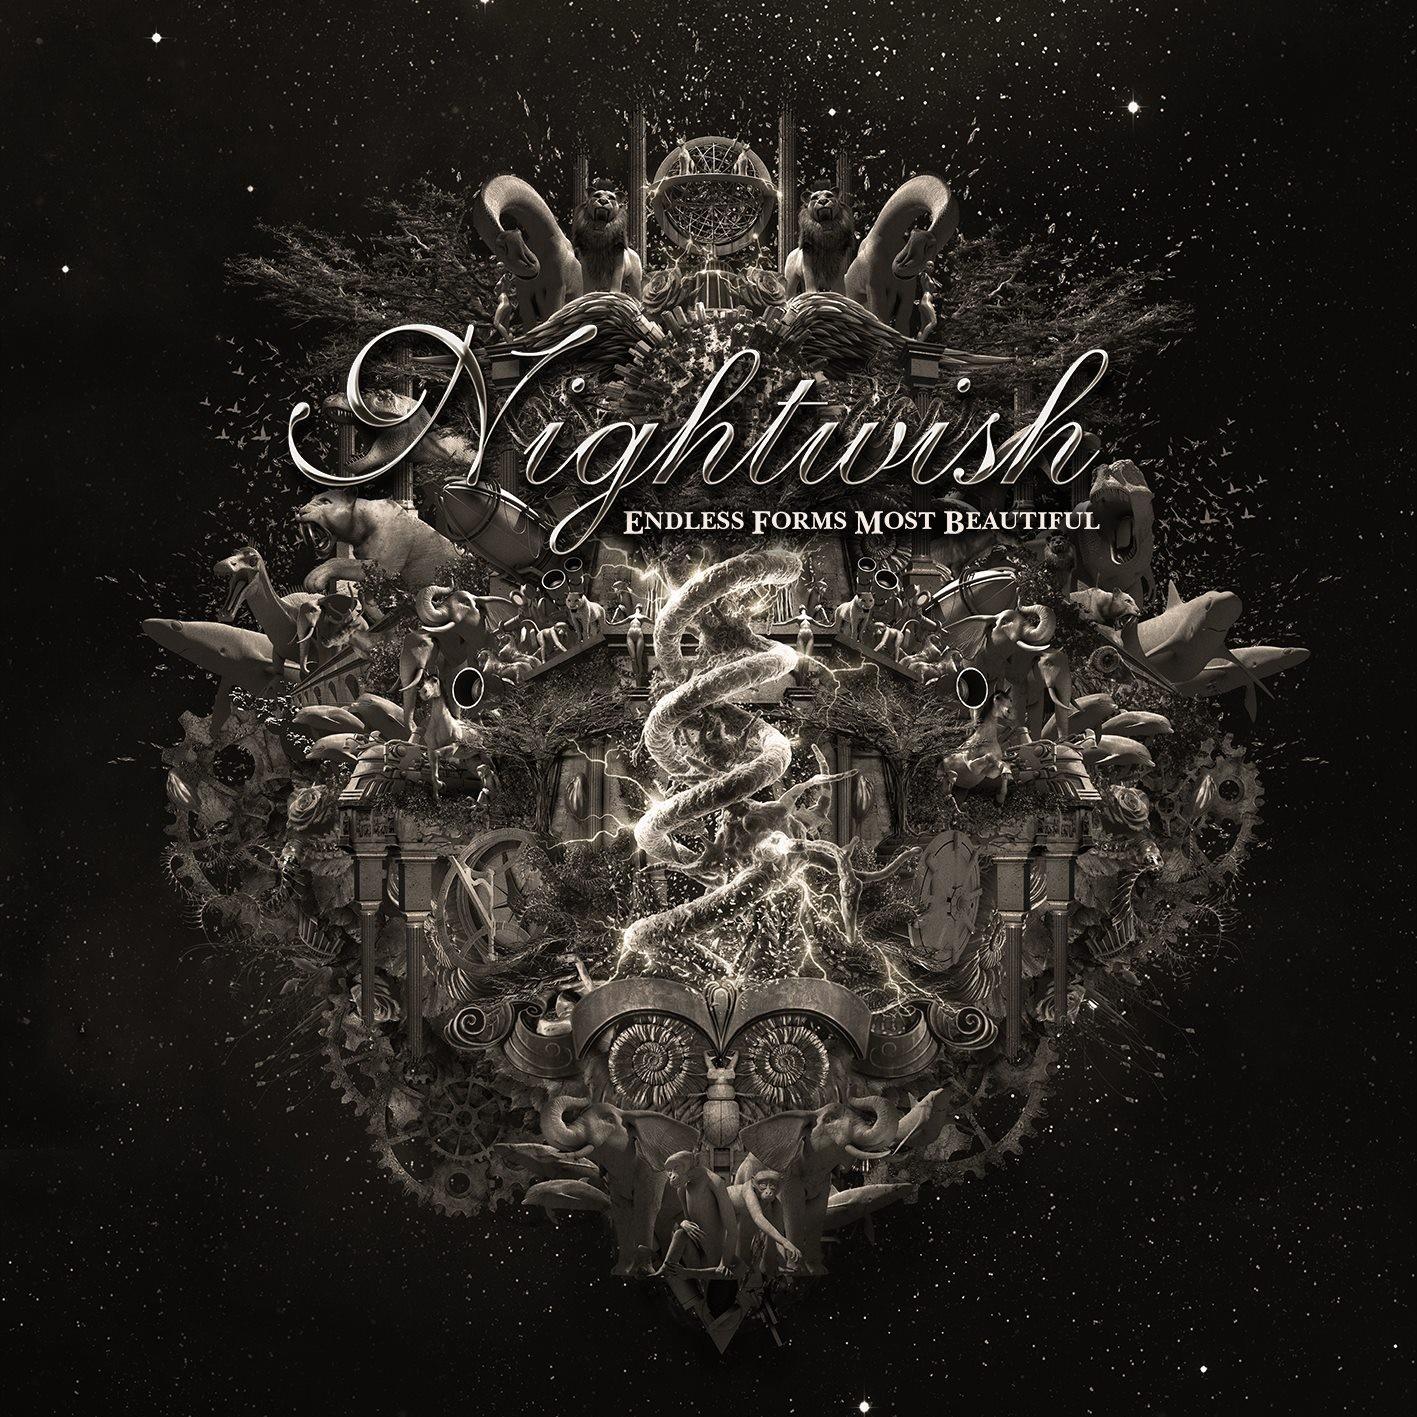 Album Endless Forms Most Beautiful (Nightwish Polska)